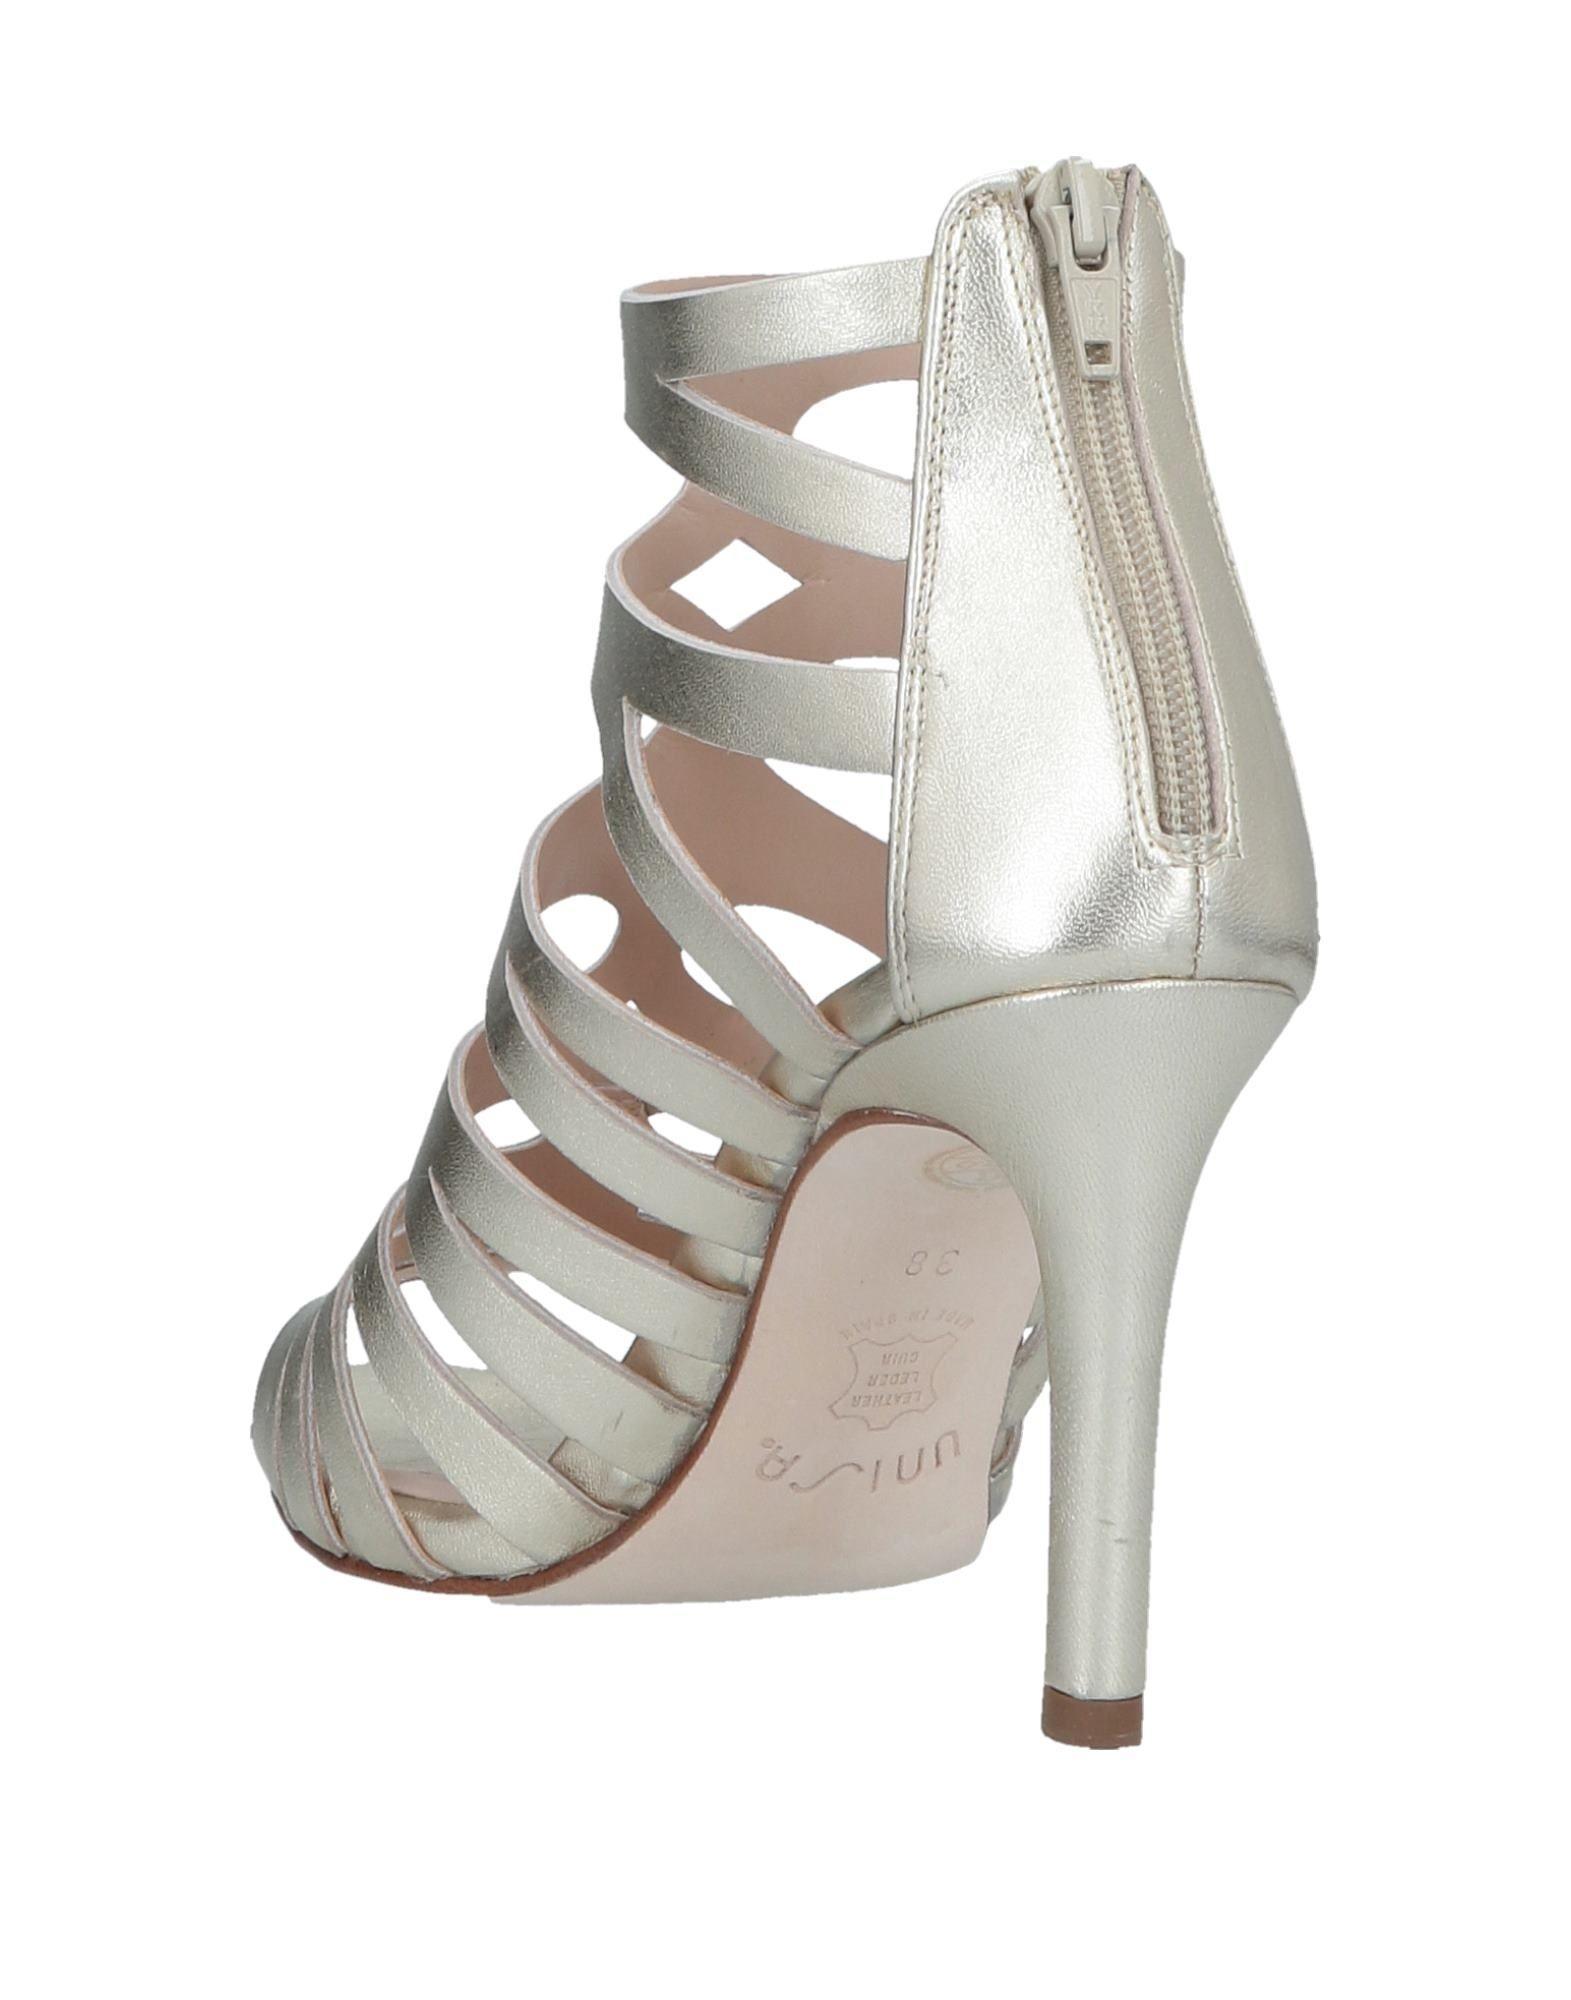 257a7581b Lyst - Unisa Sandals in Metallic